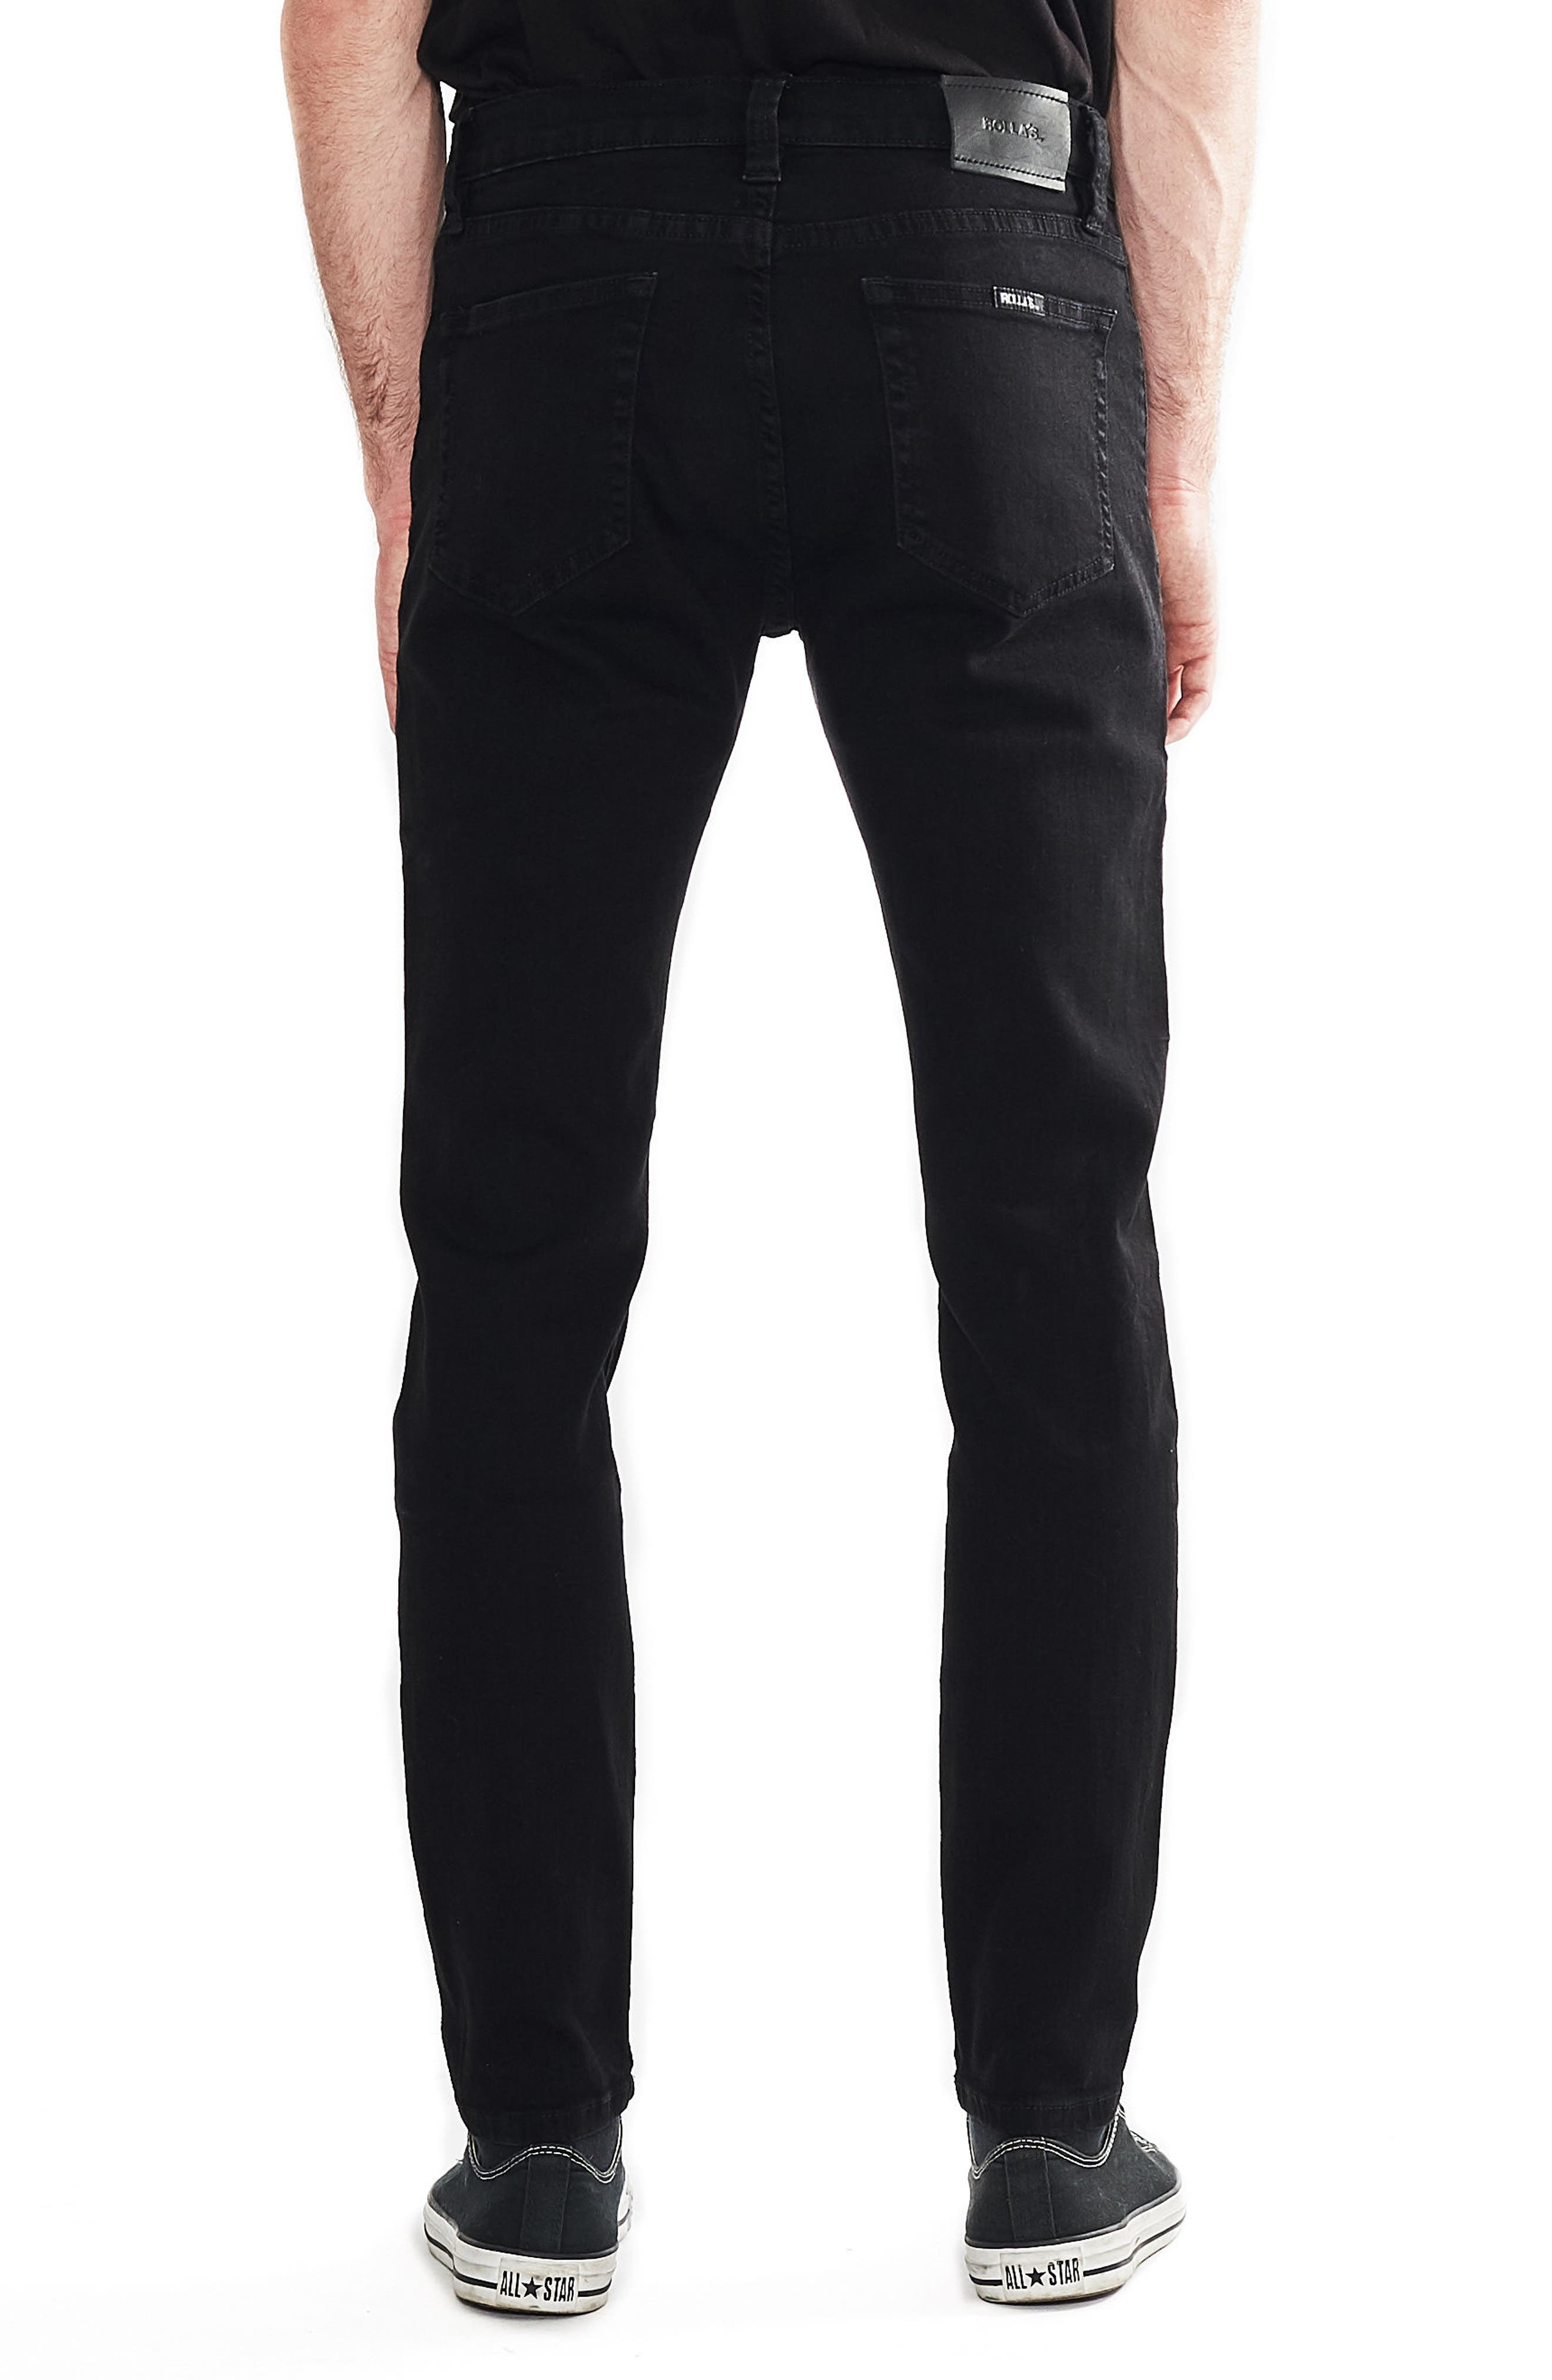 Stinger Skinny Fit Jeans,                             Alternate thumbnail 2, color,                             Black Gold